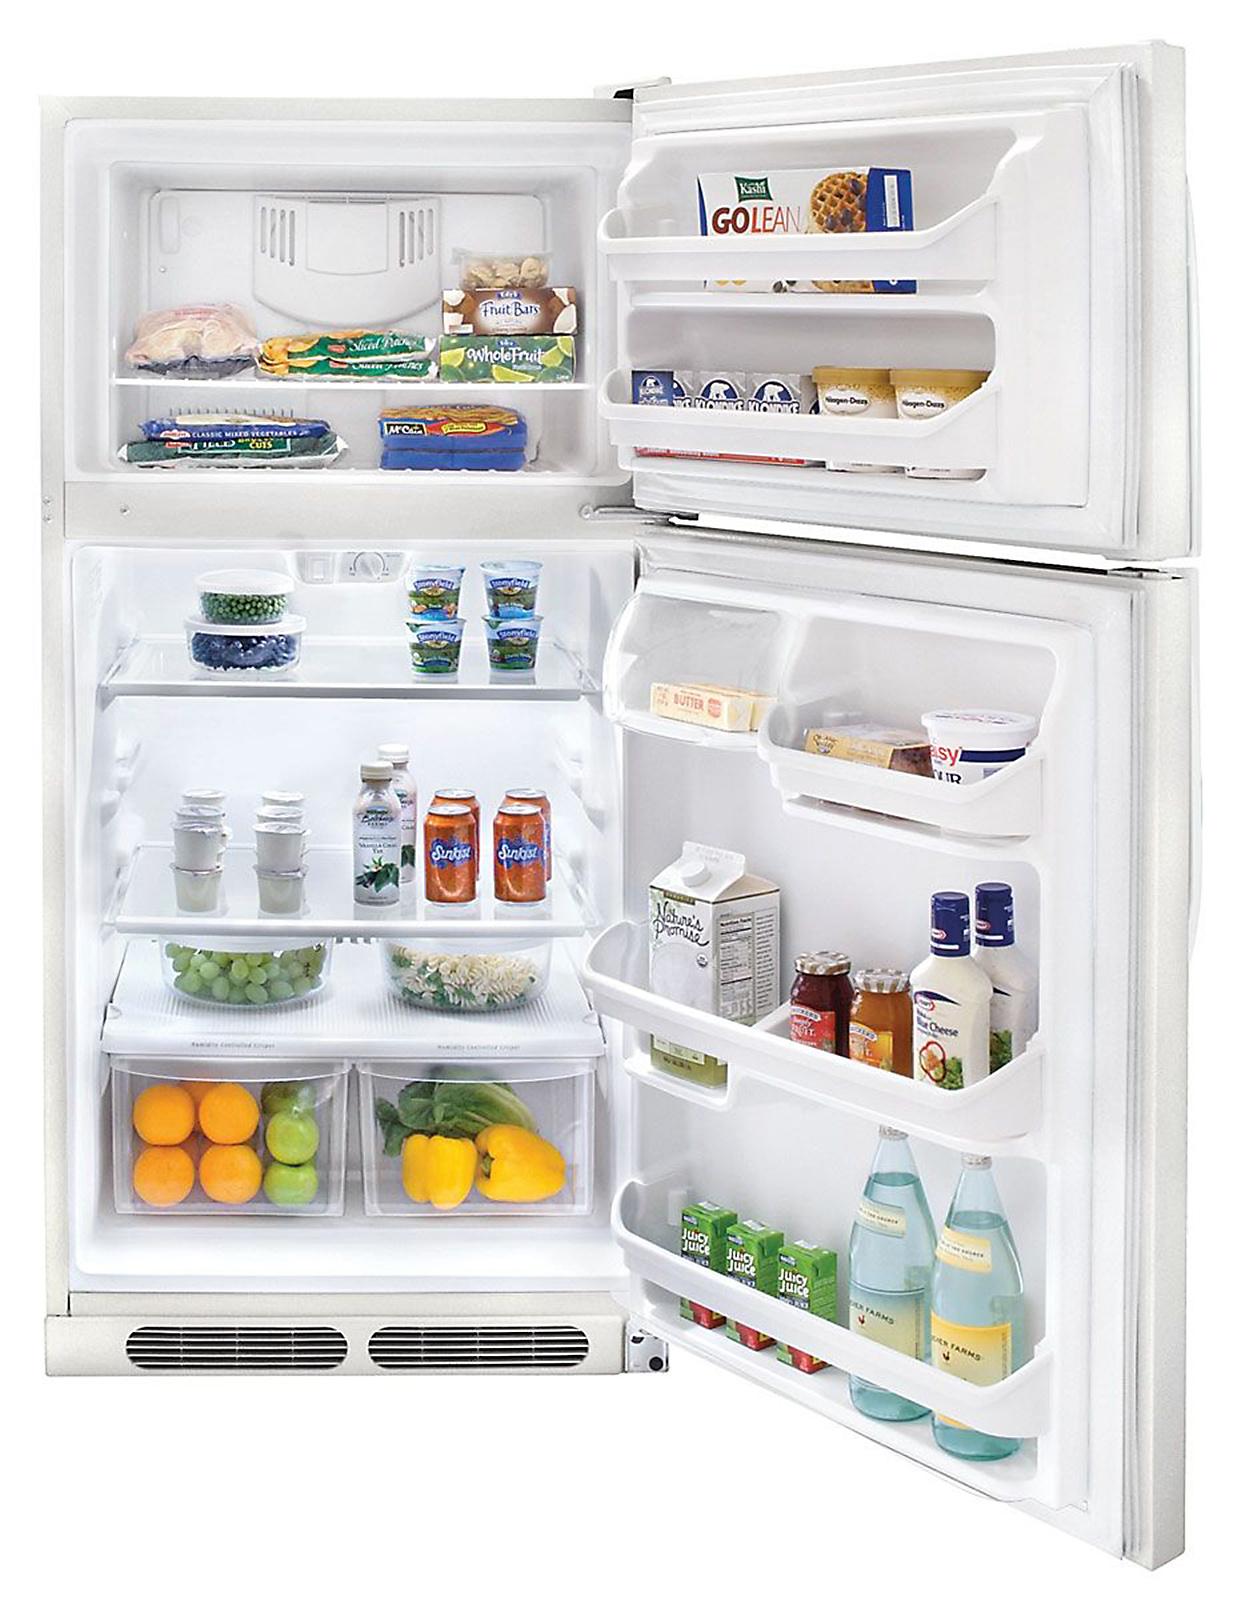 Kenmore 14.8 cu. ft. Top-Freezer Refrigerator - White